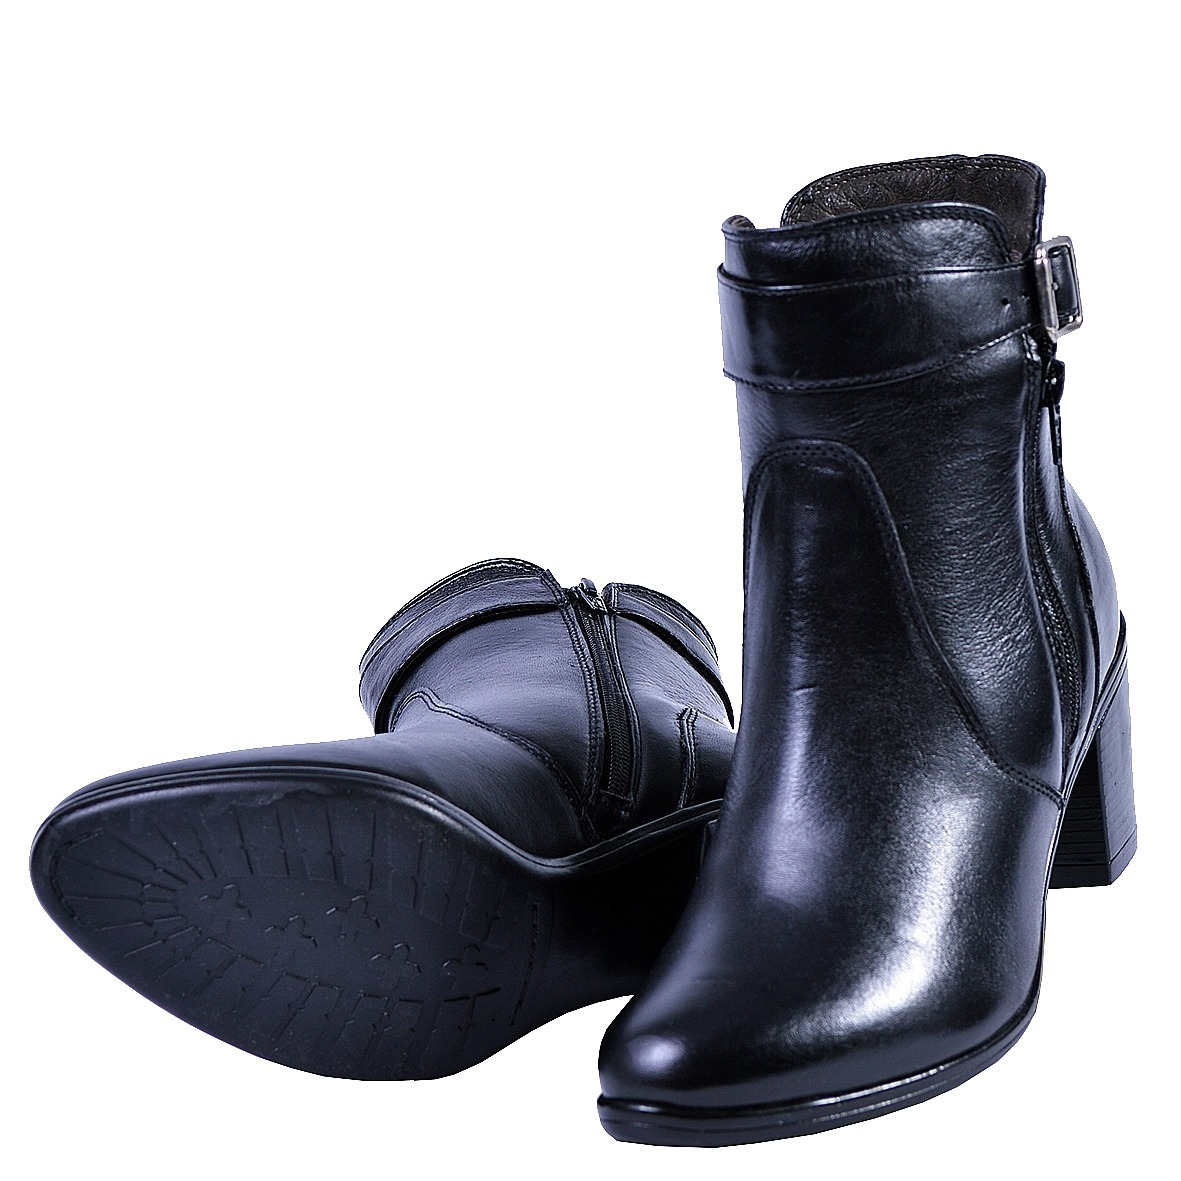 ccf8ef20a coturno feminino bota cano curto couro marrom rock 234. Carregando zoom.